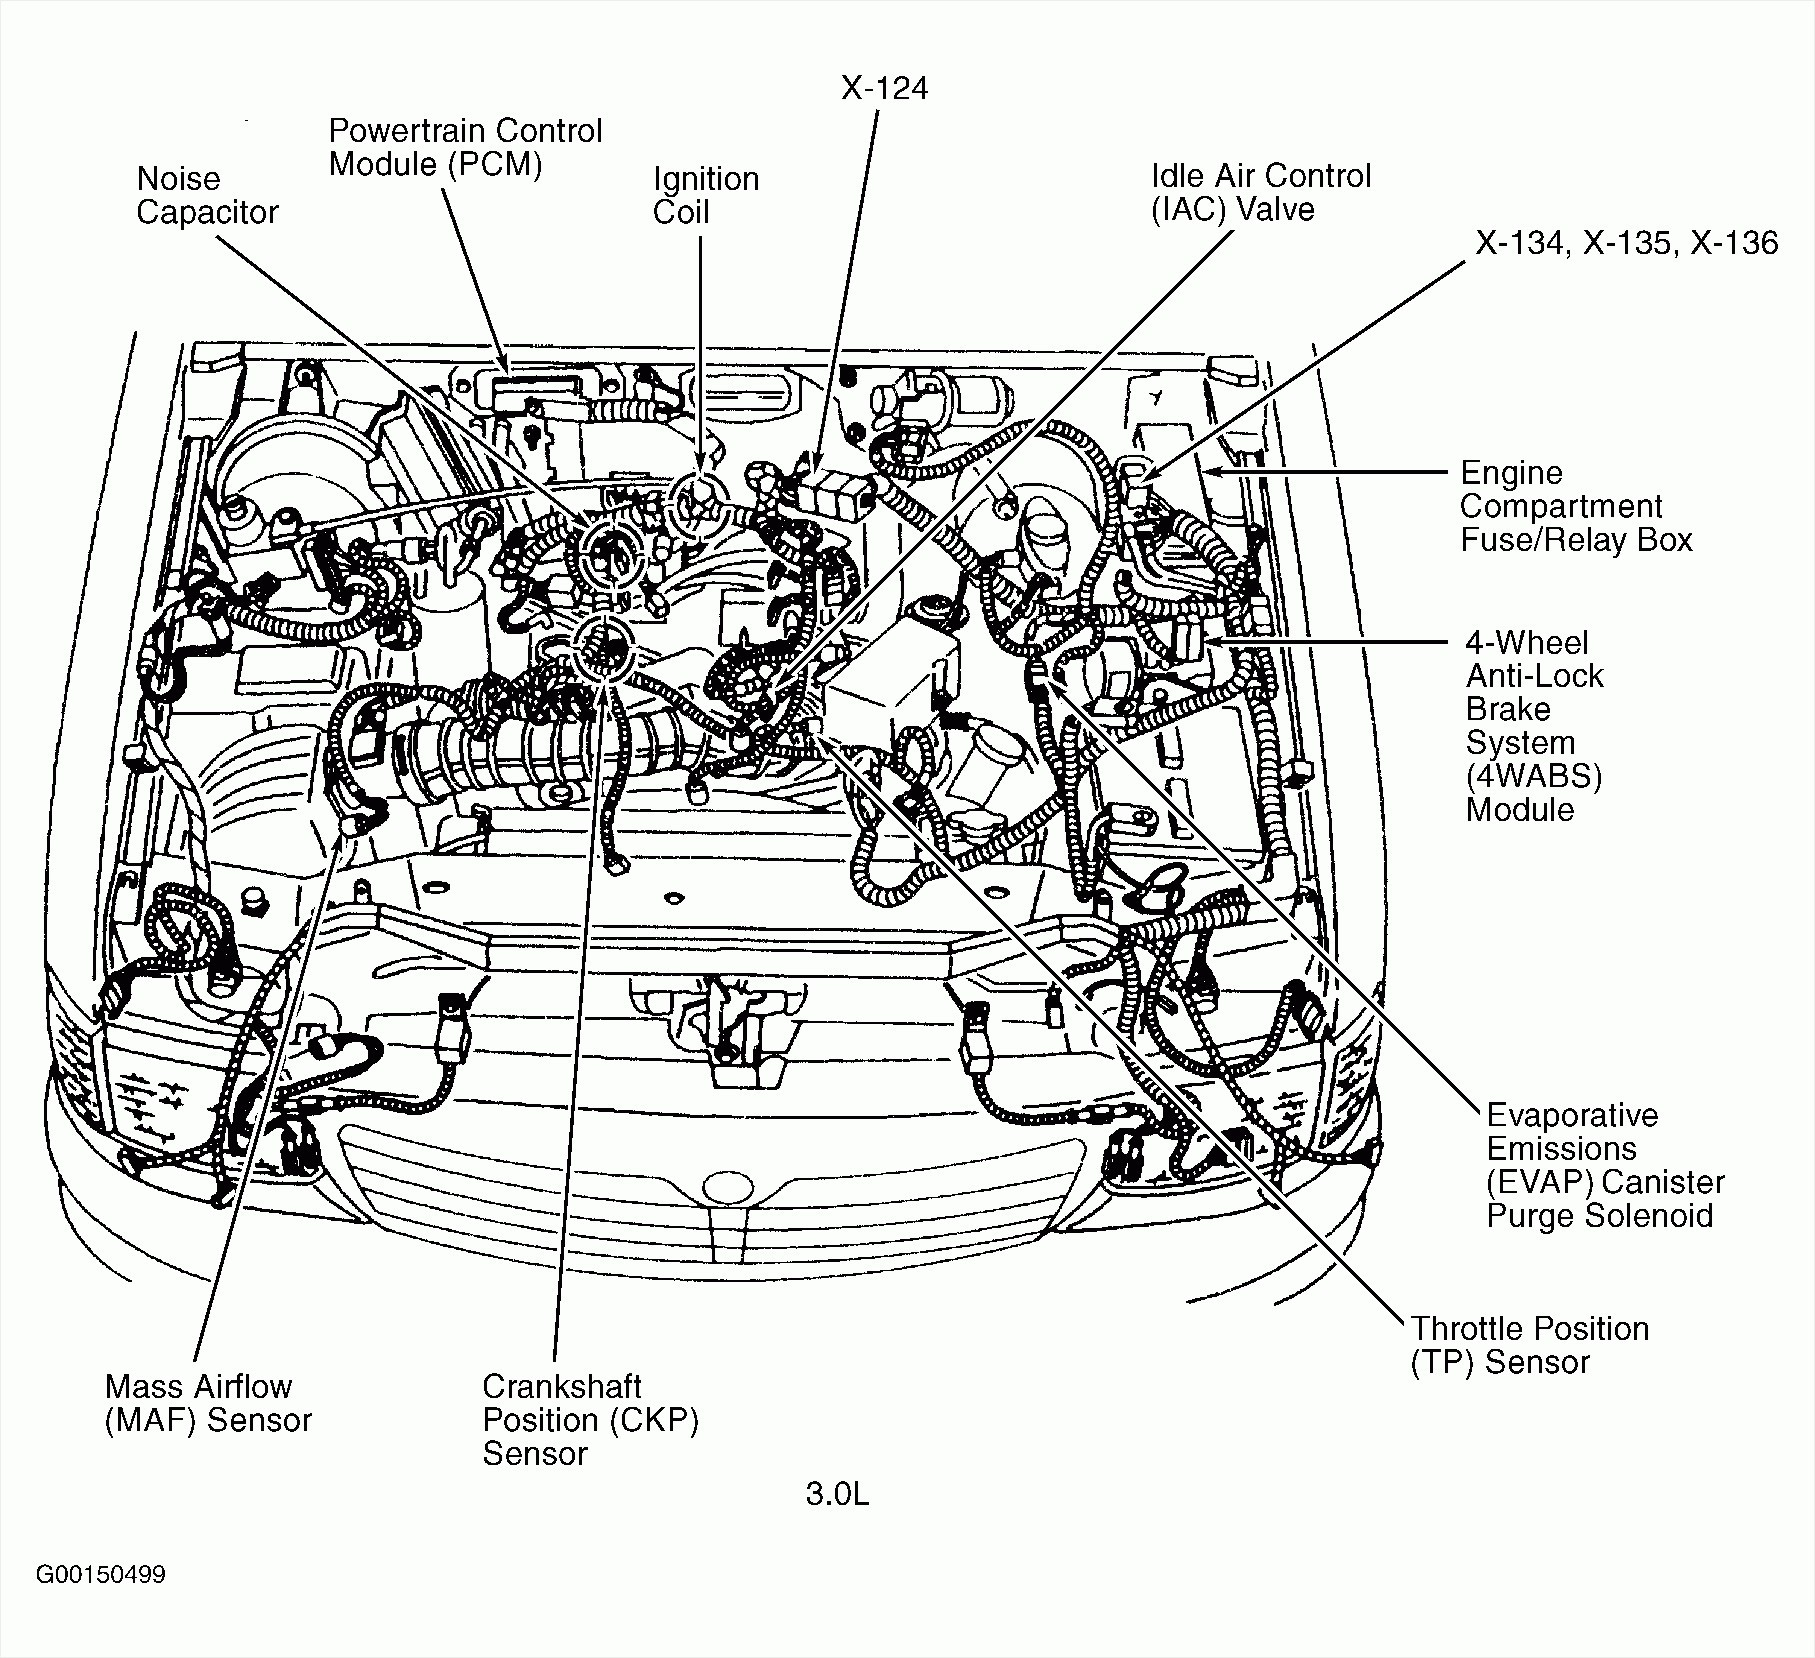 2010 Dodge Grand Caravan Engine Diagram Chrysler Seat Heater Wiring Diagram Toshiba Yenpancane Jeanjaures37 Fr